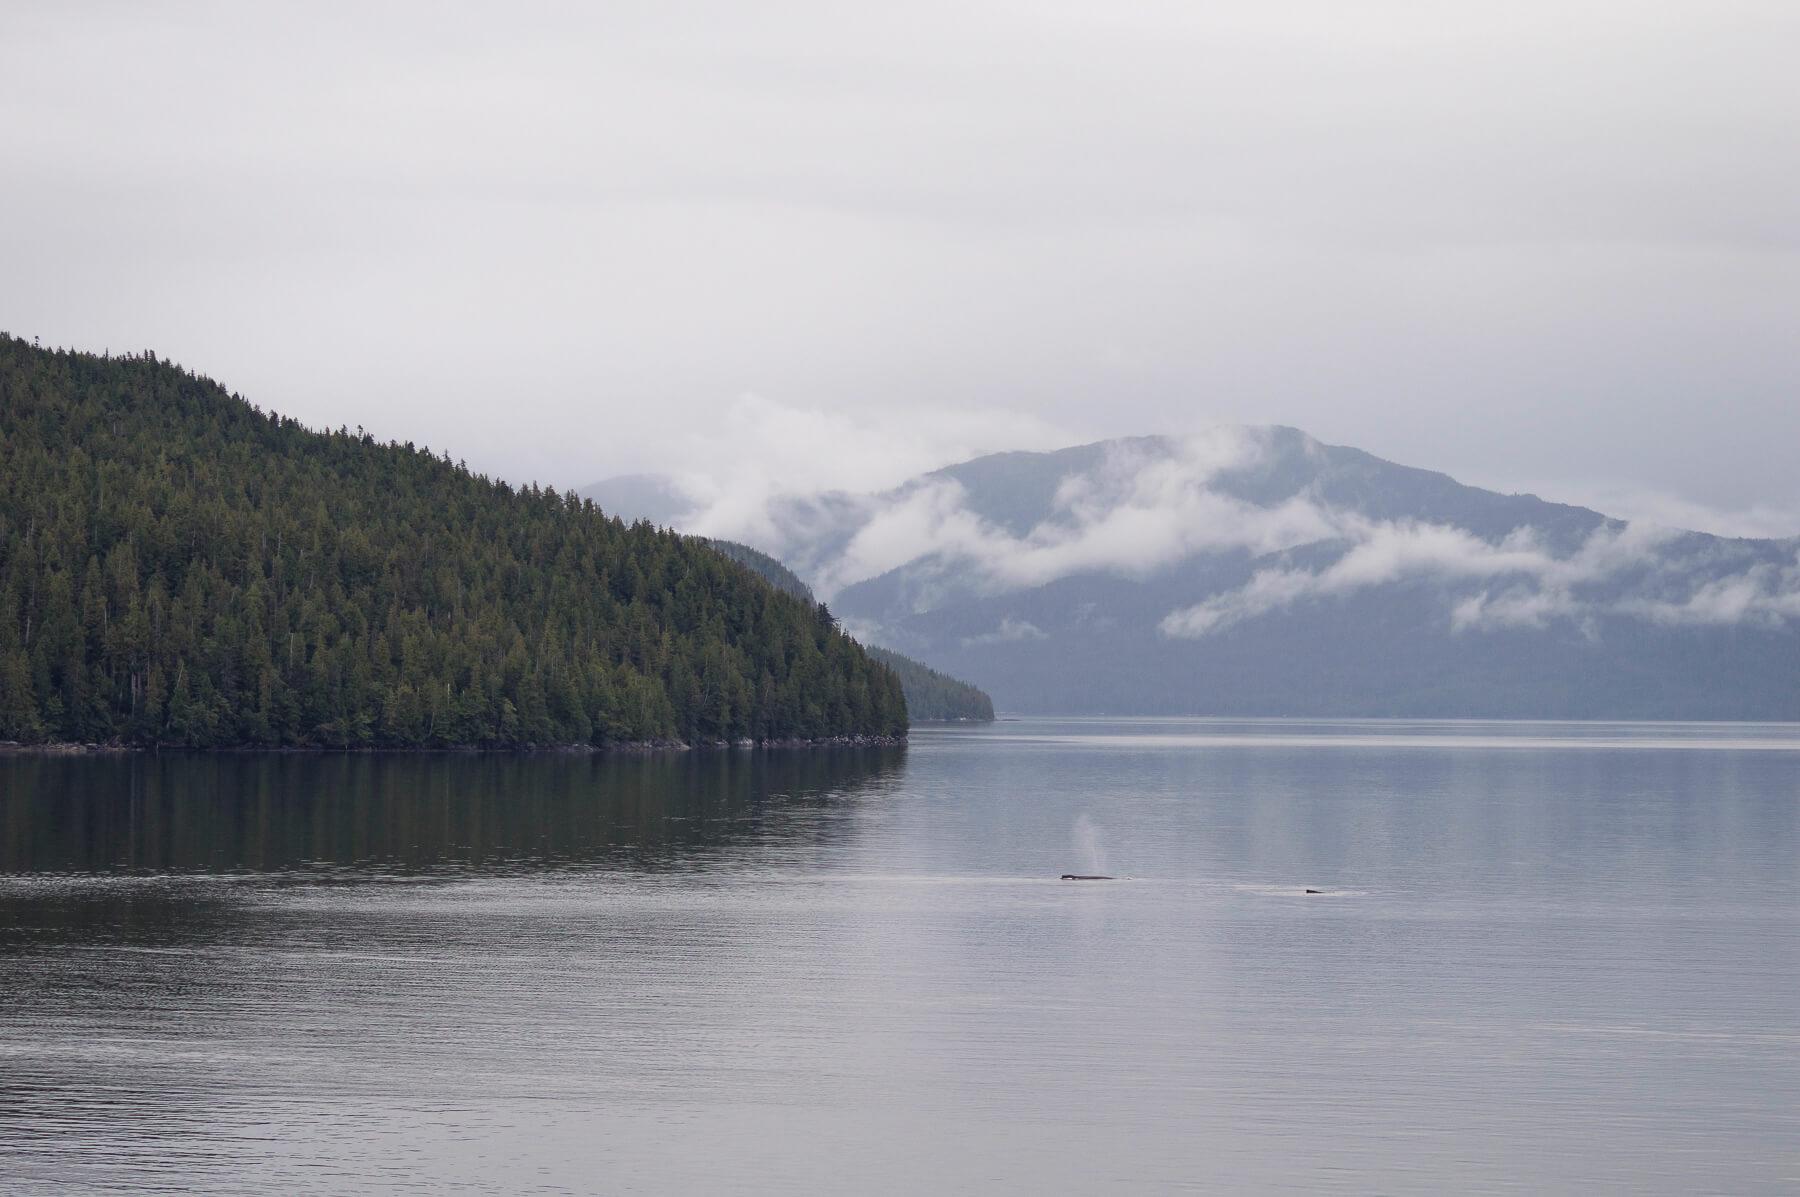 2 humpback whales breaching in Alaska